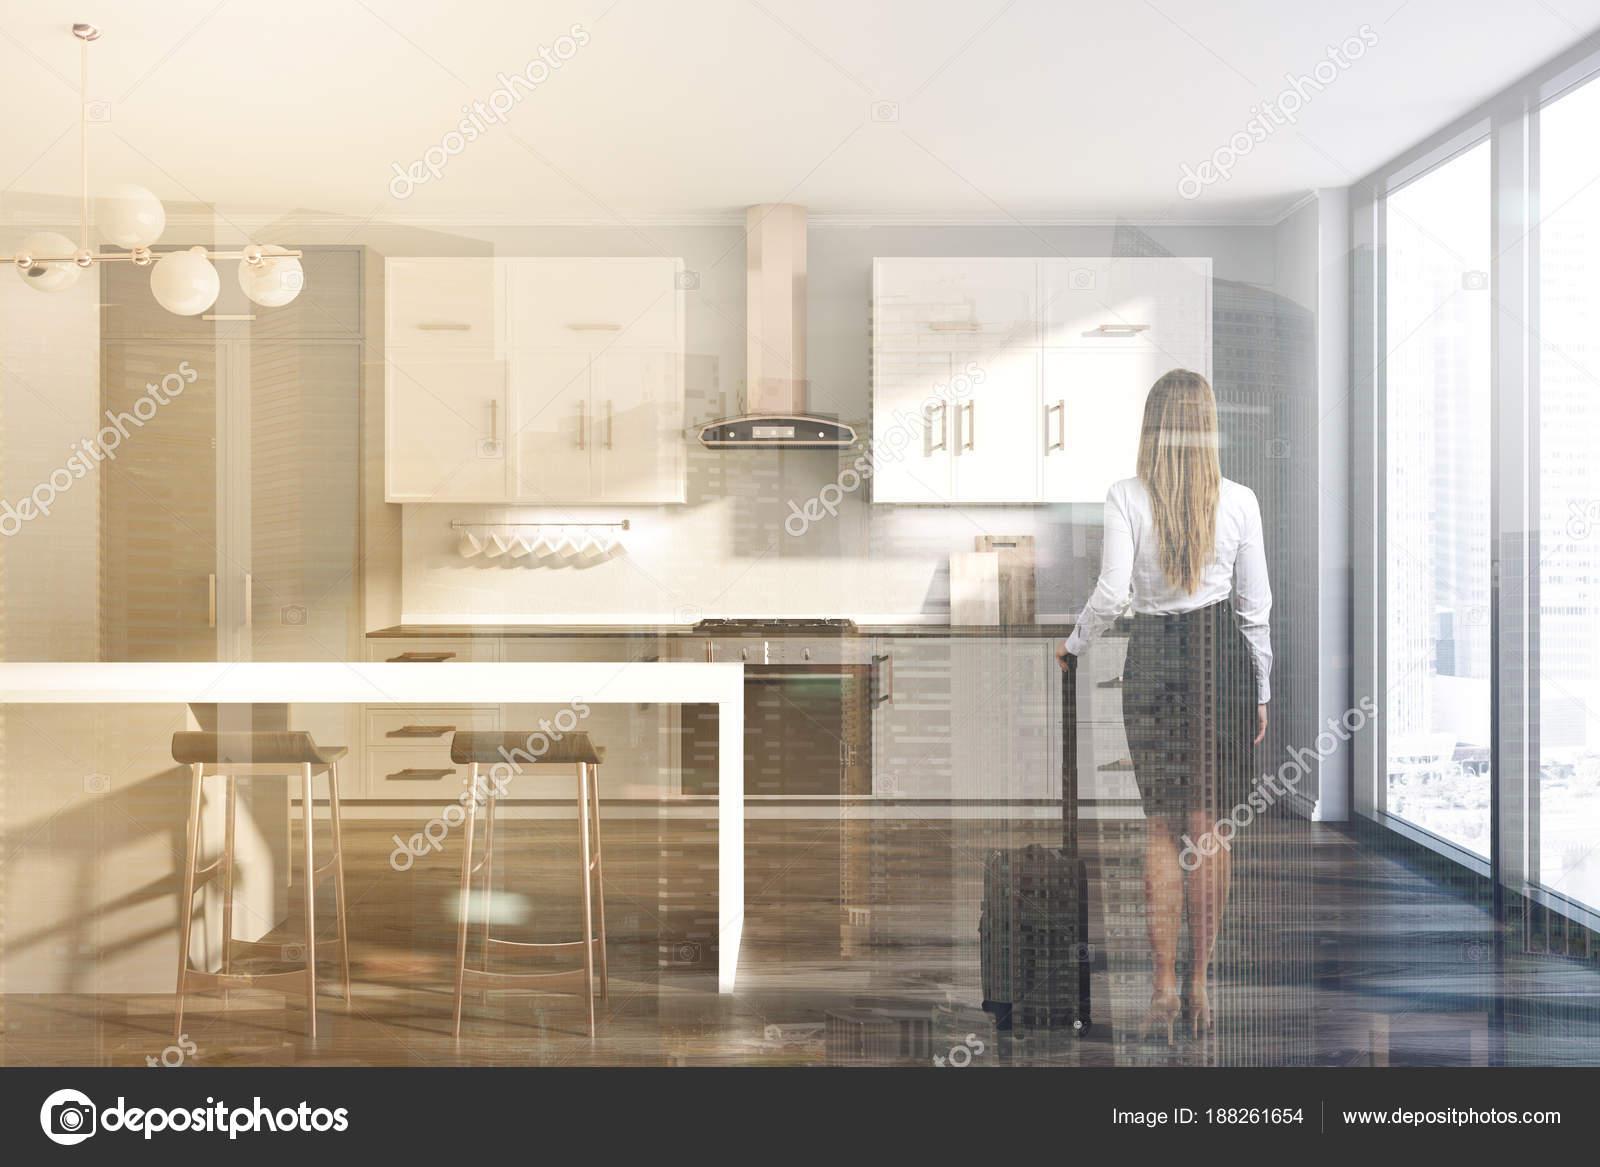 https://st3.depositphotos.com/2673929/18826/i/1600/depositphotos_188261654-stock-photo-gray-kitchen-white-and-gray.jpg